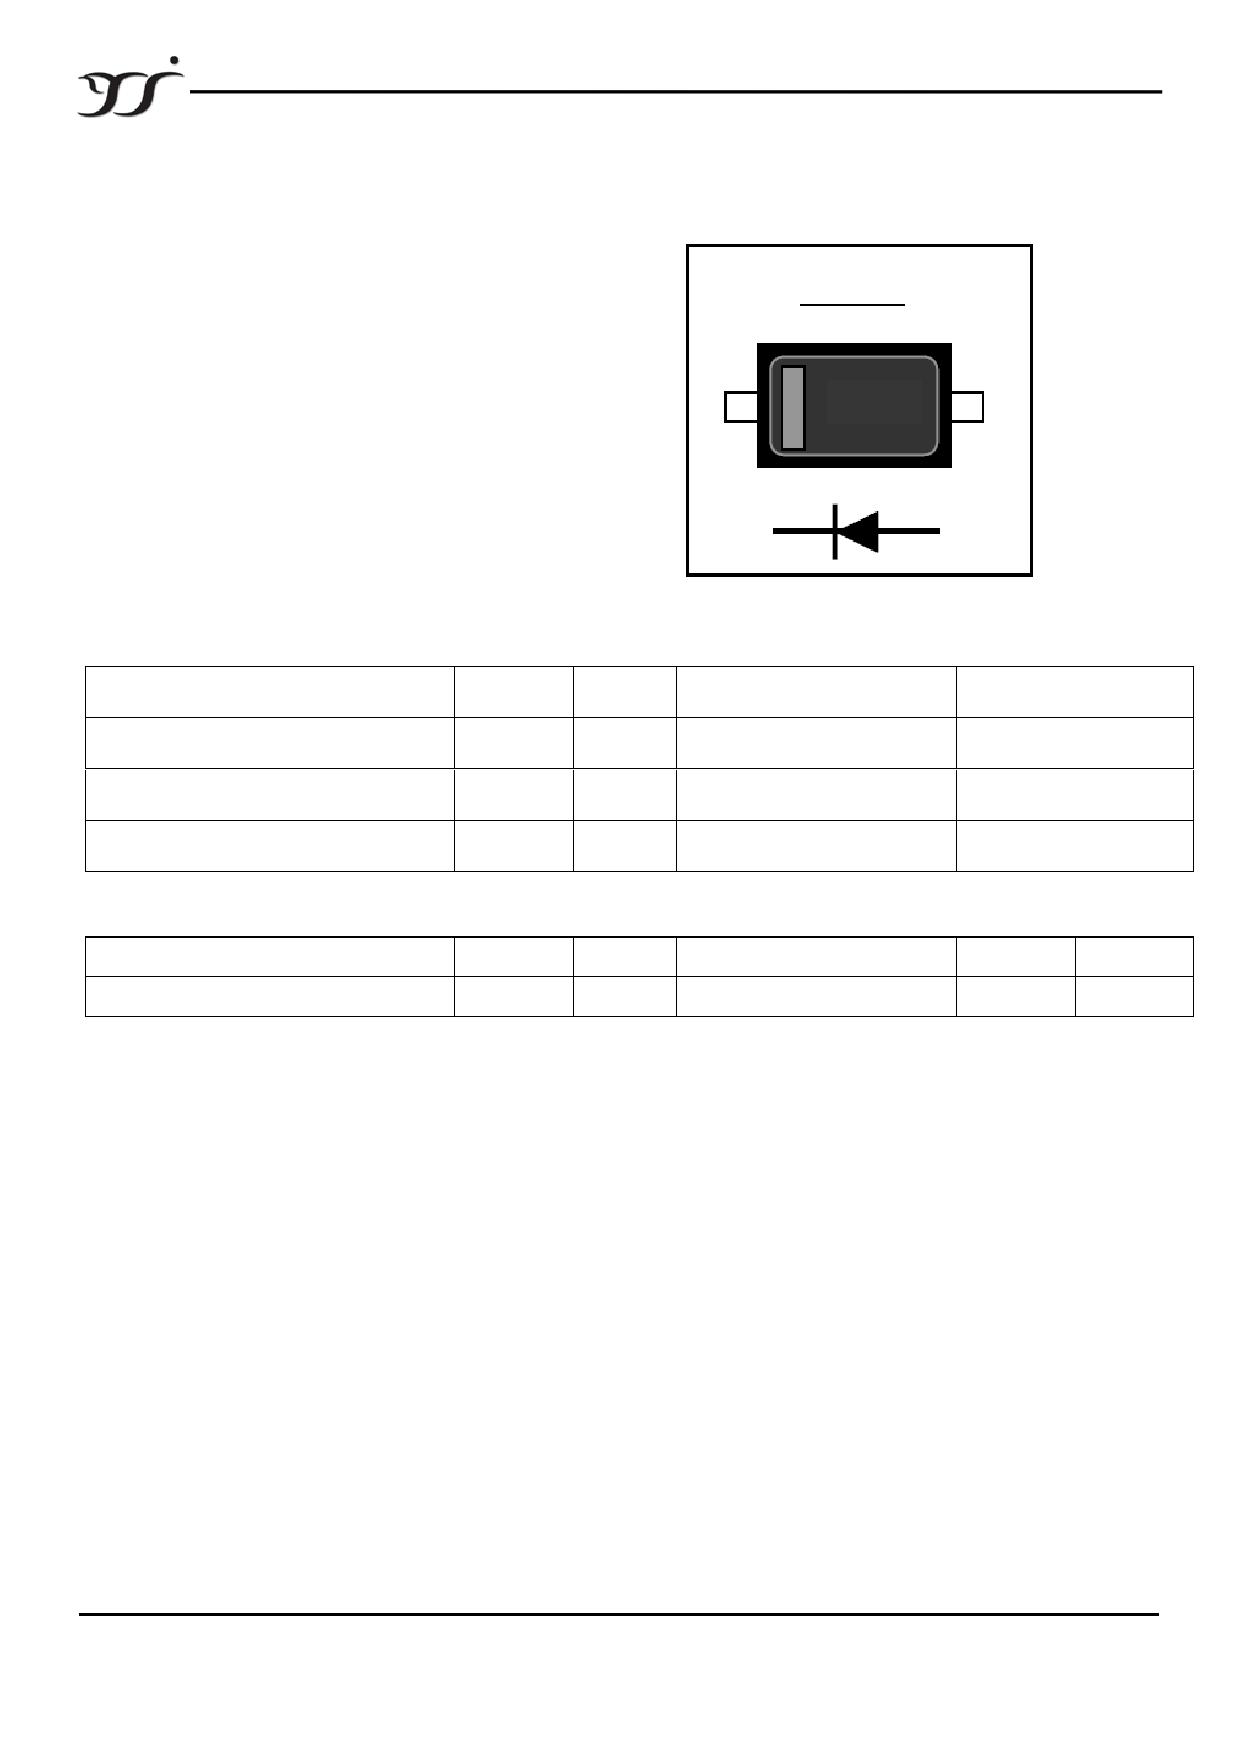 MMSZ5234B Datasheet